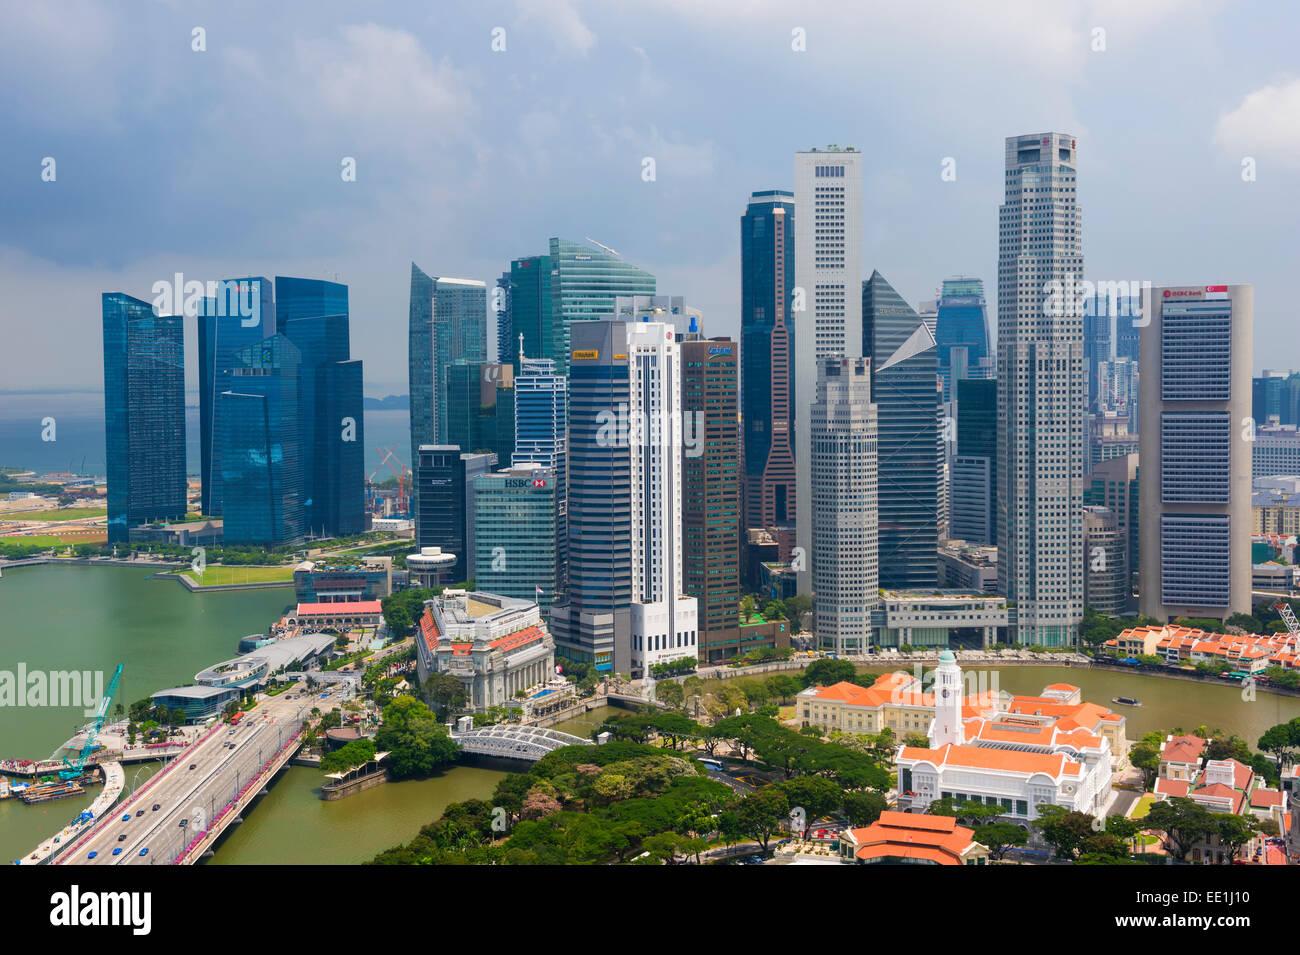 Downtown center financial district, Singapore, Southeast Asia, Asia - Stock Image